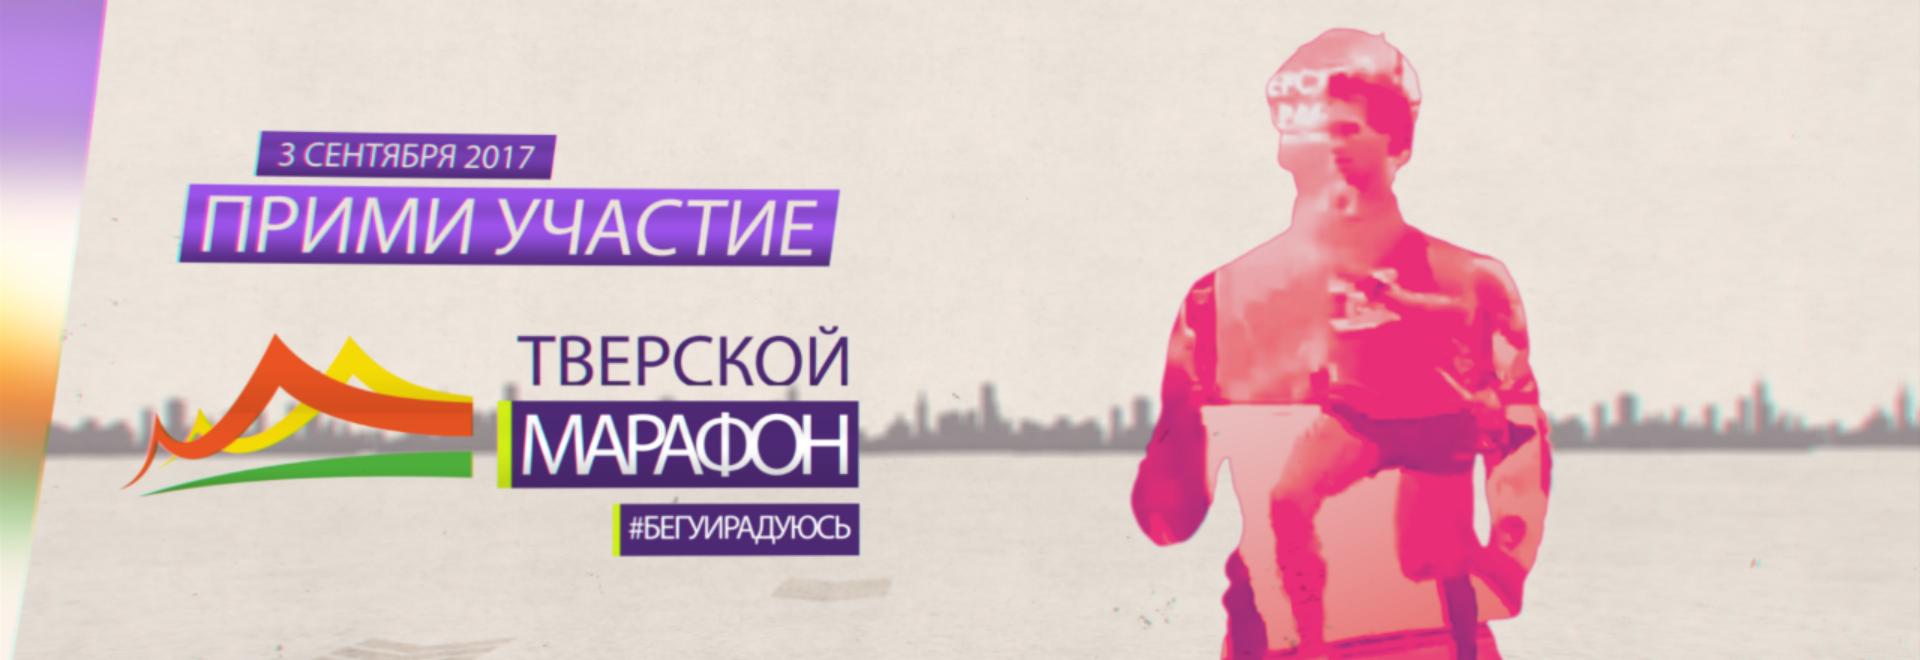 Тверской марафон 1920х660